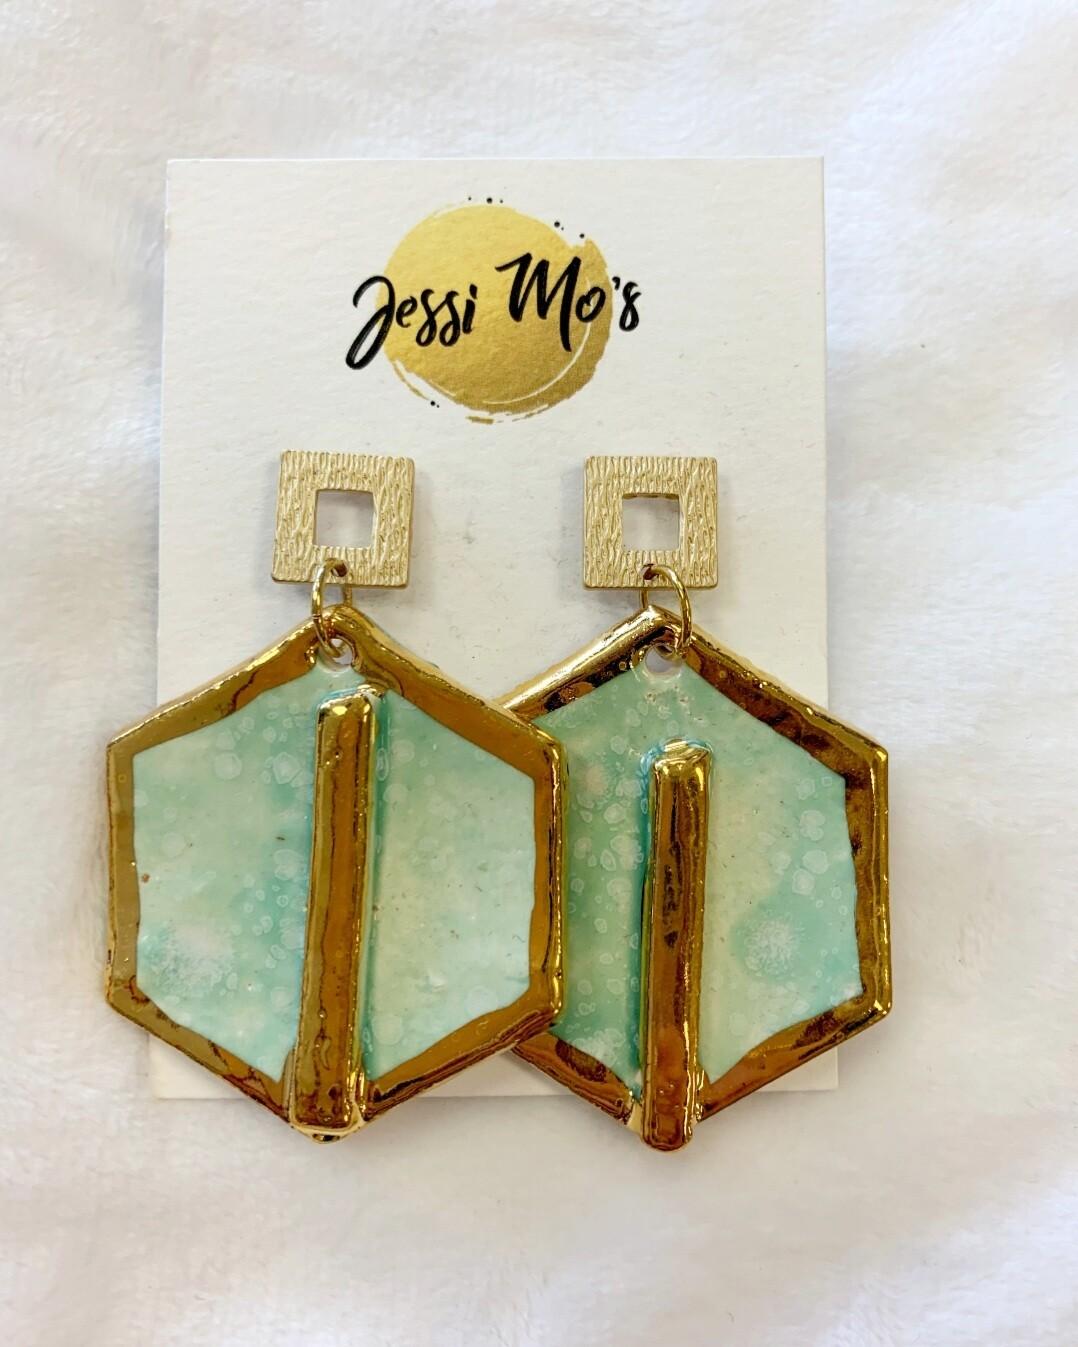 Jessi Mo's Ceramic Earrings- Seafoam Glaze- 2 Options